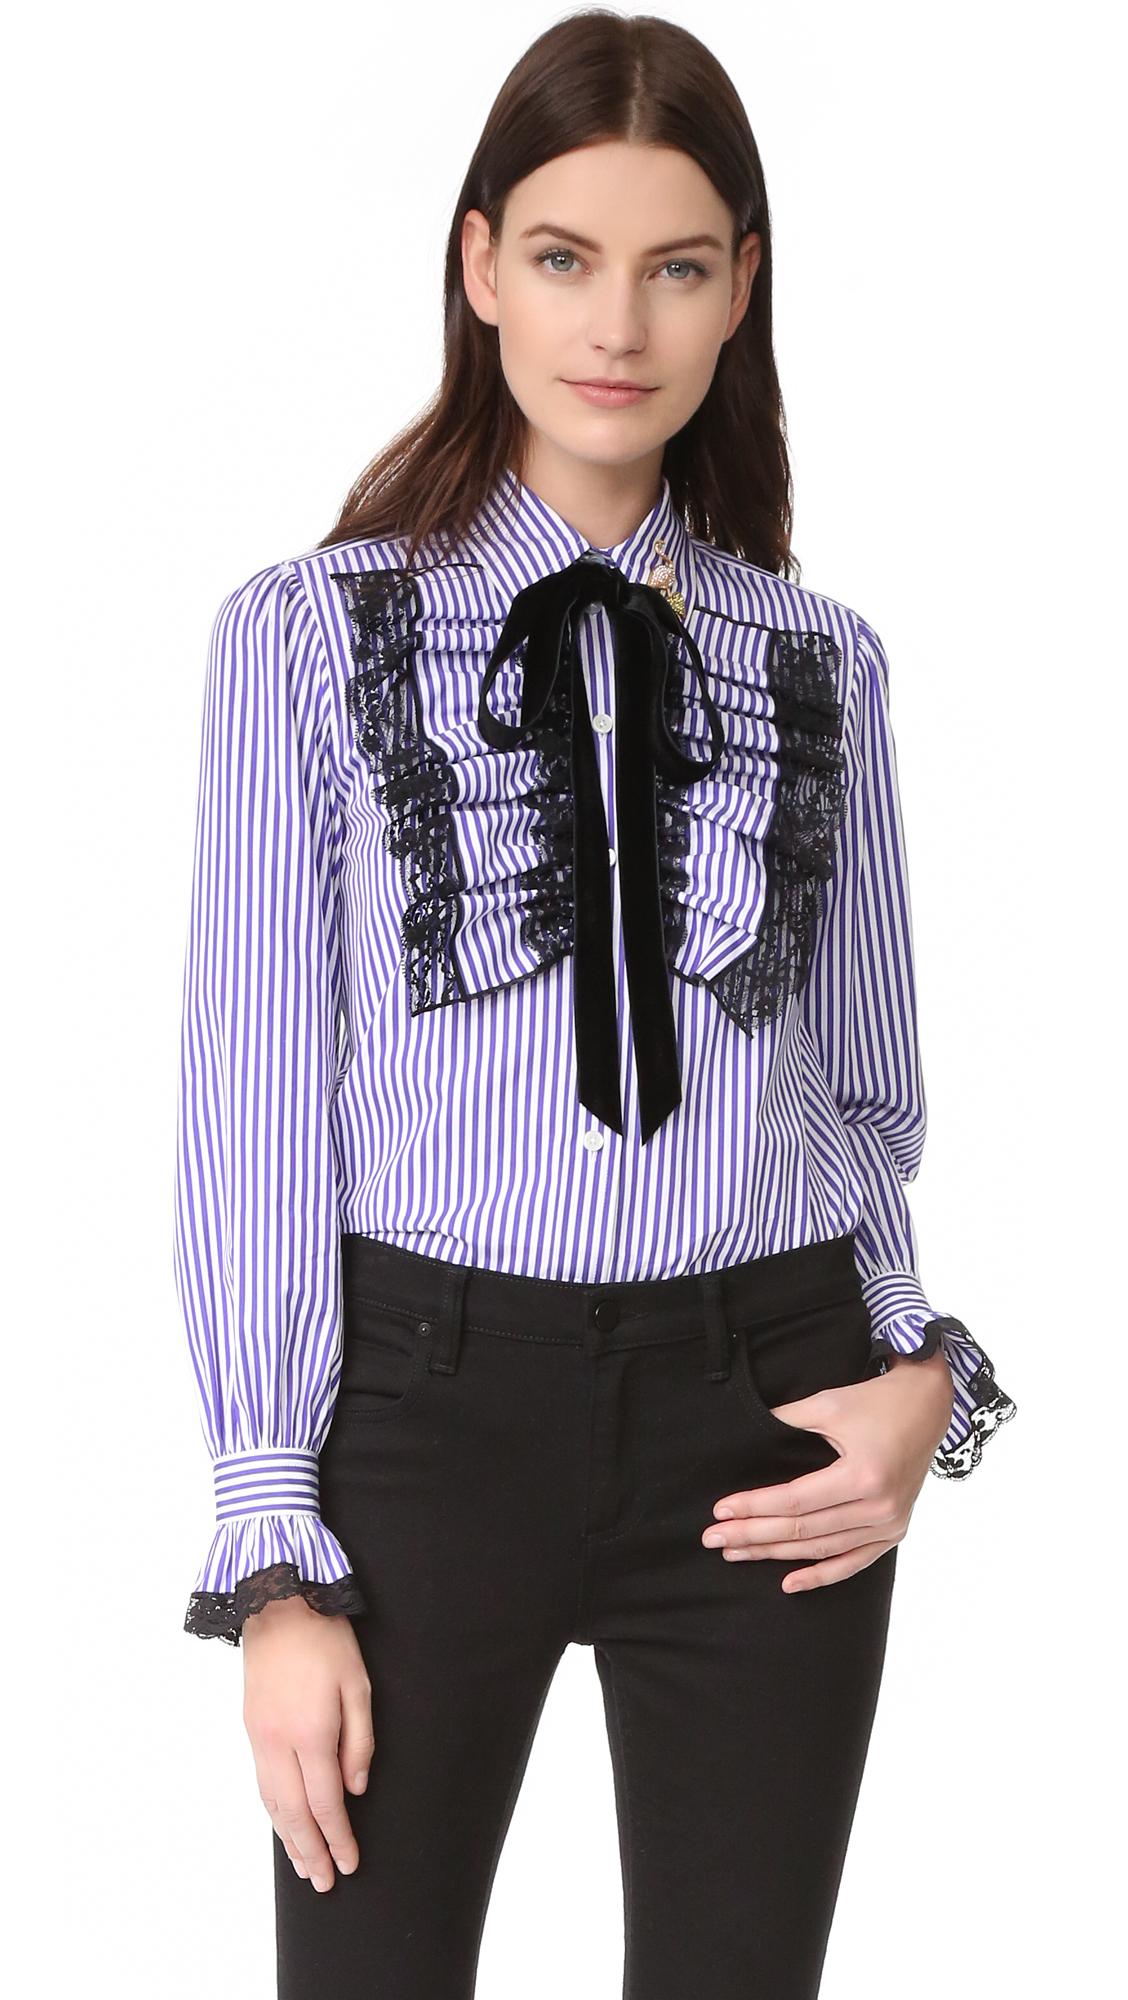 marc jacobs female marc jacobs long sleeve blouse purple